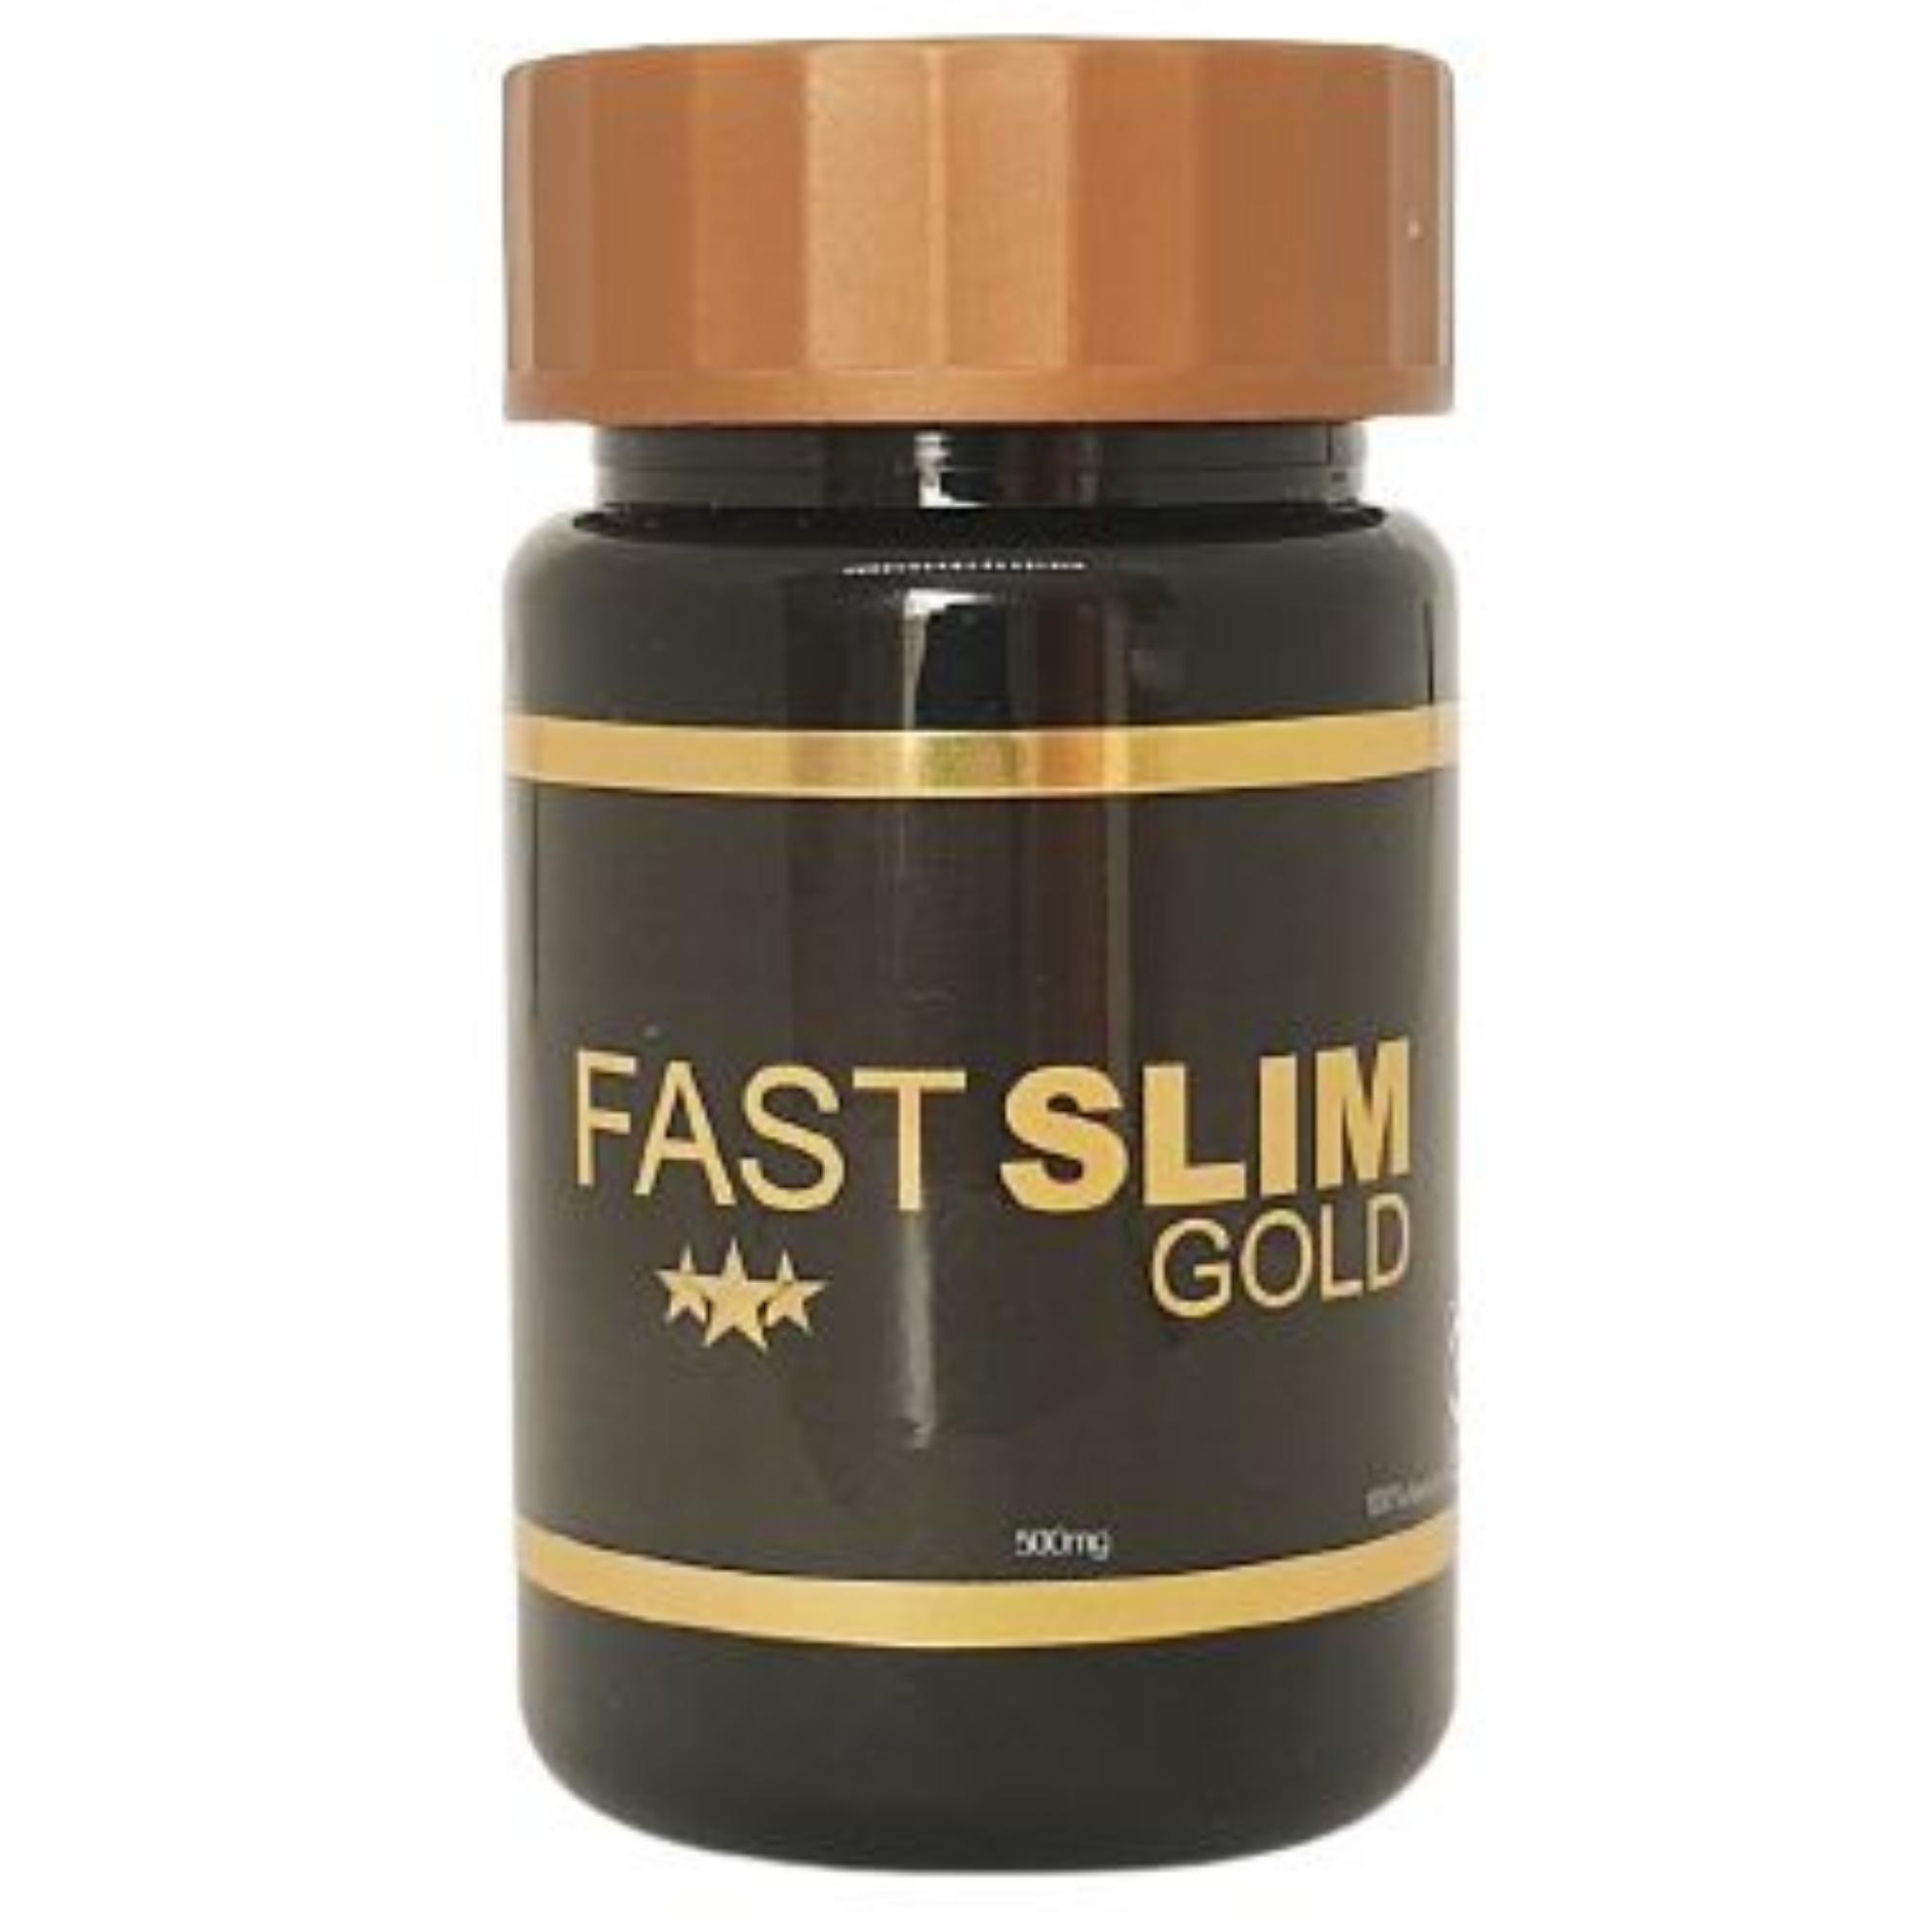 FAST SLIM GOLD